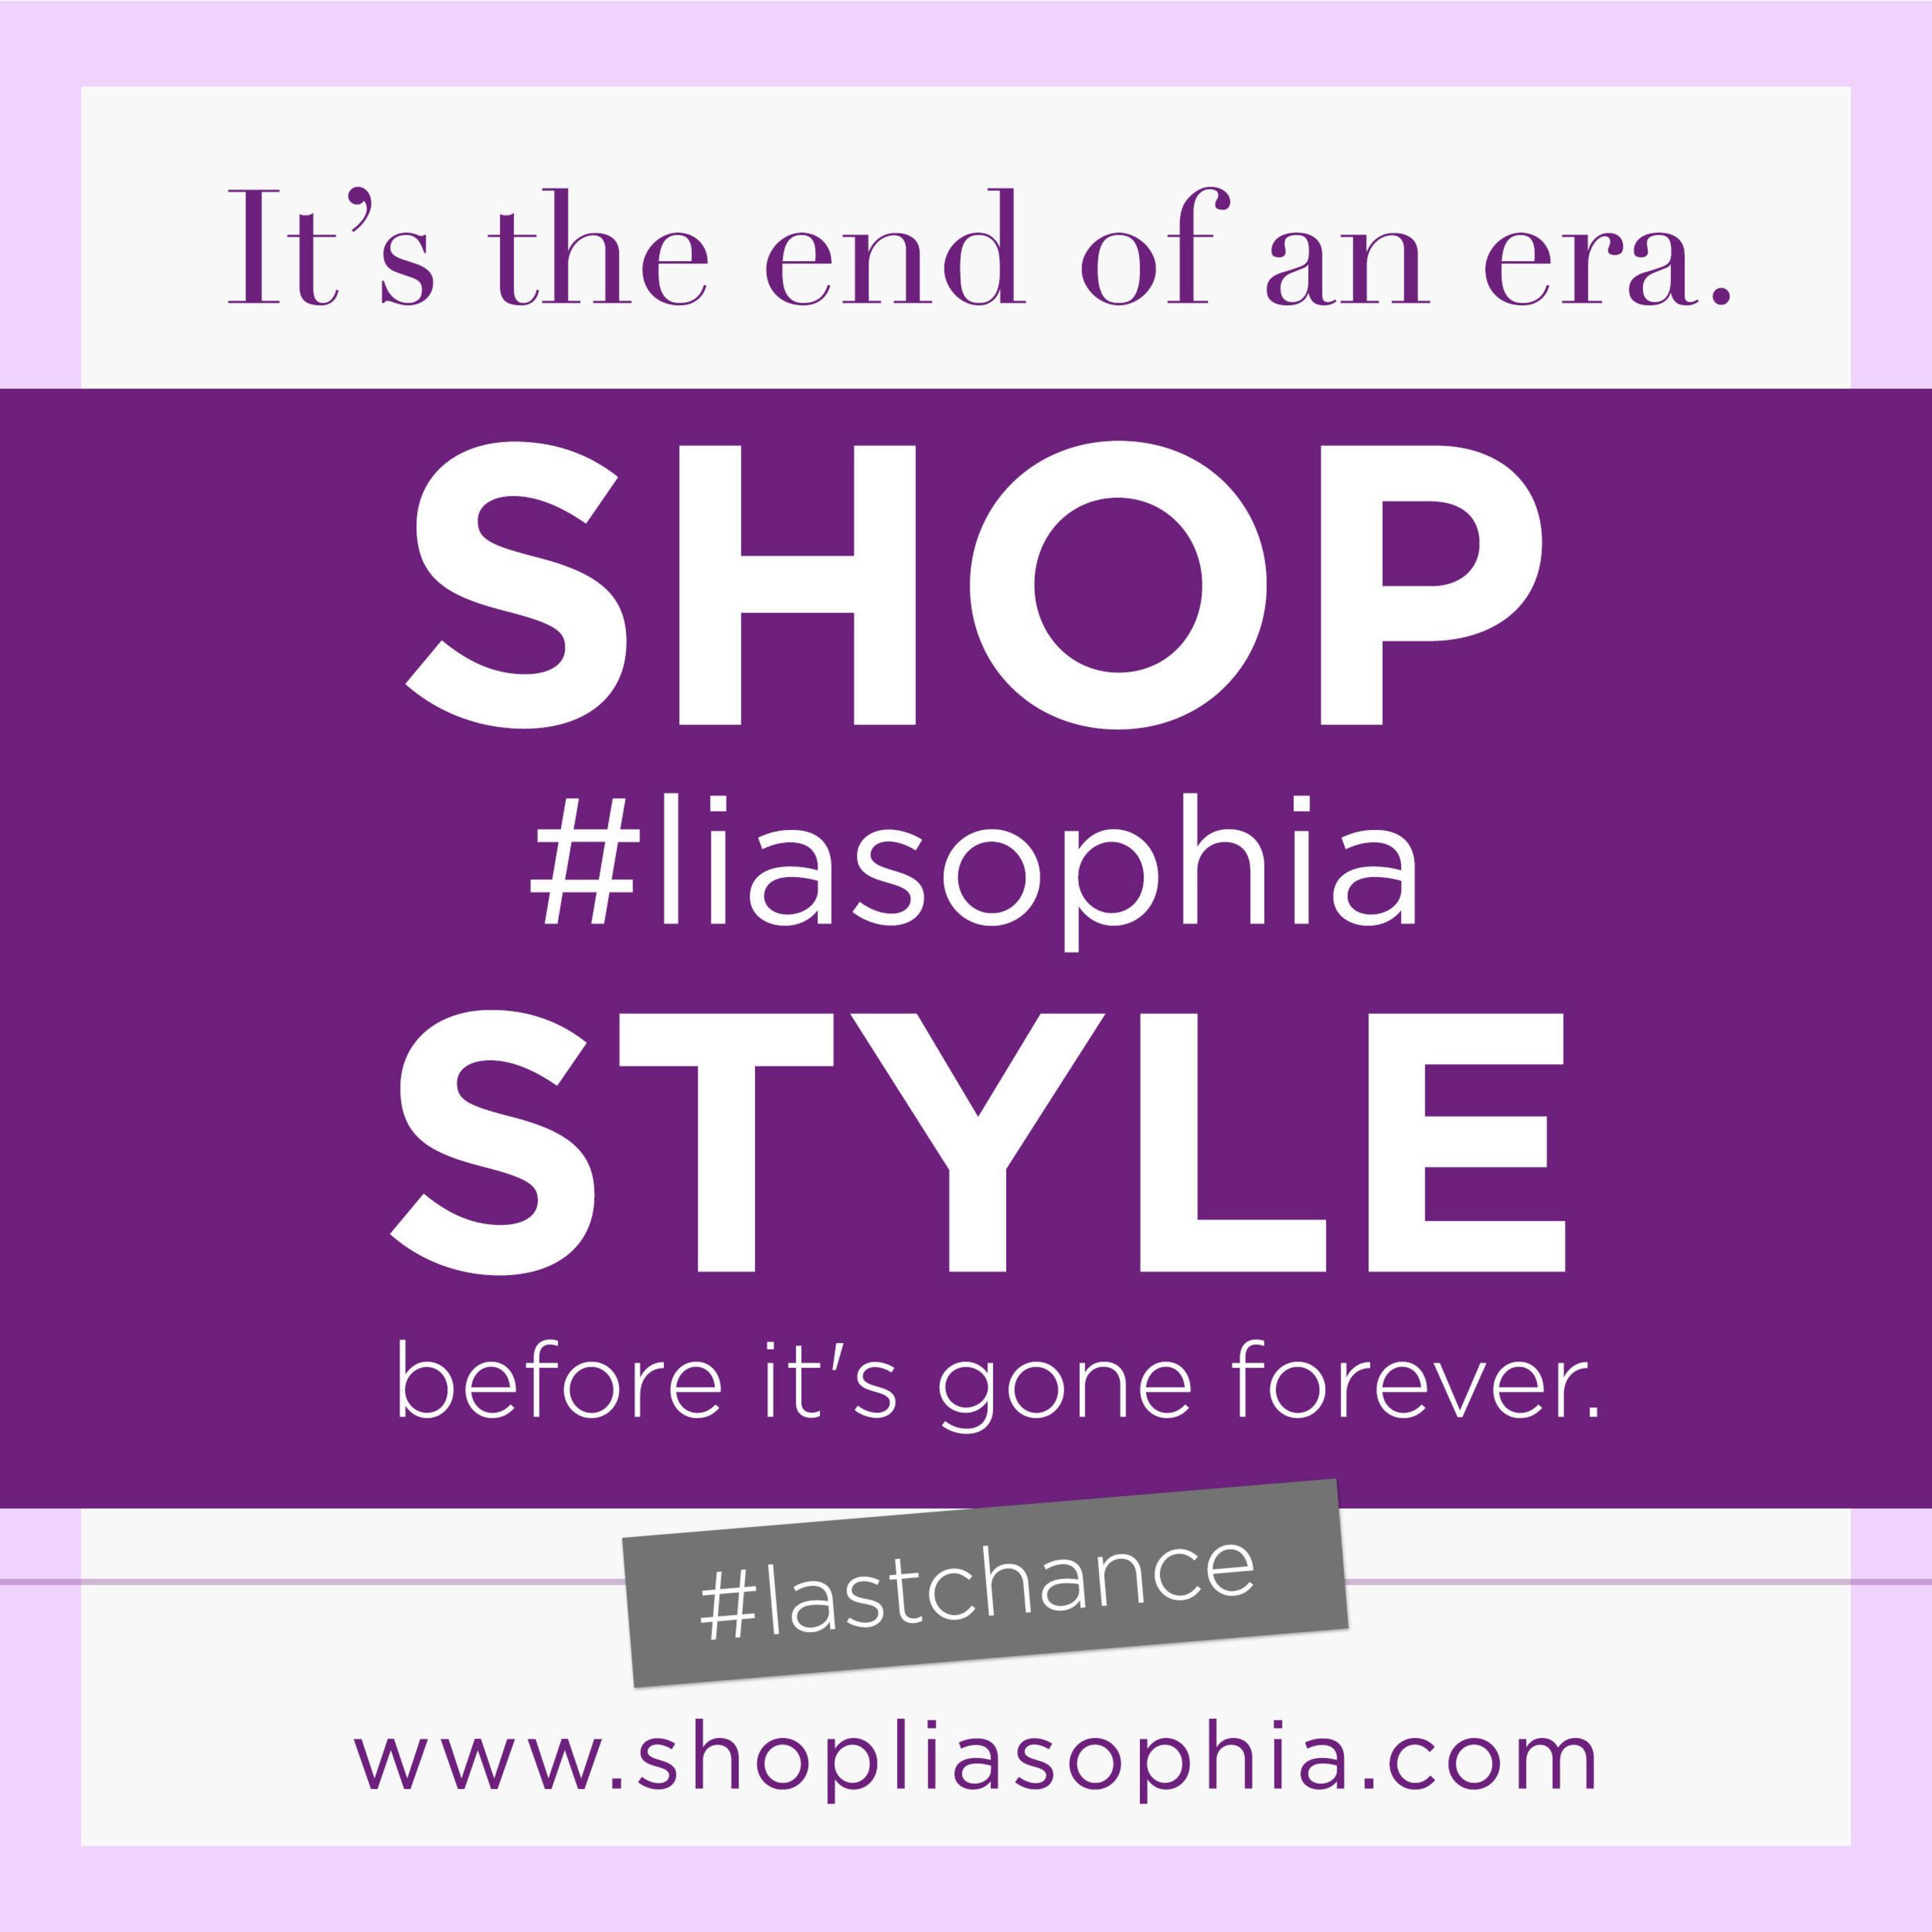 www.shopliasophia.com